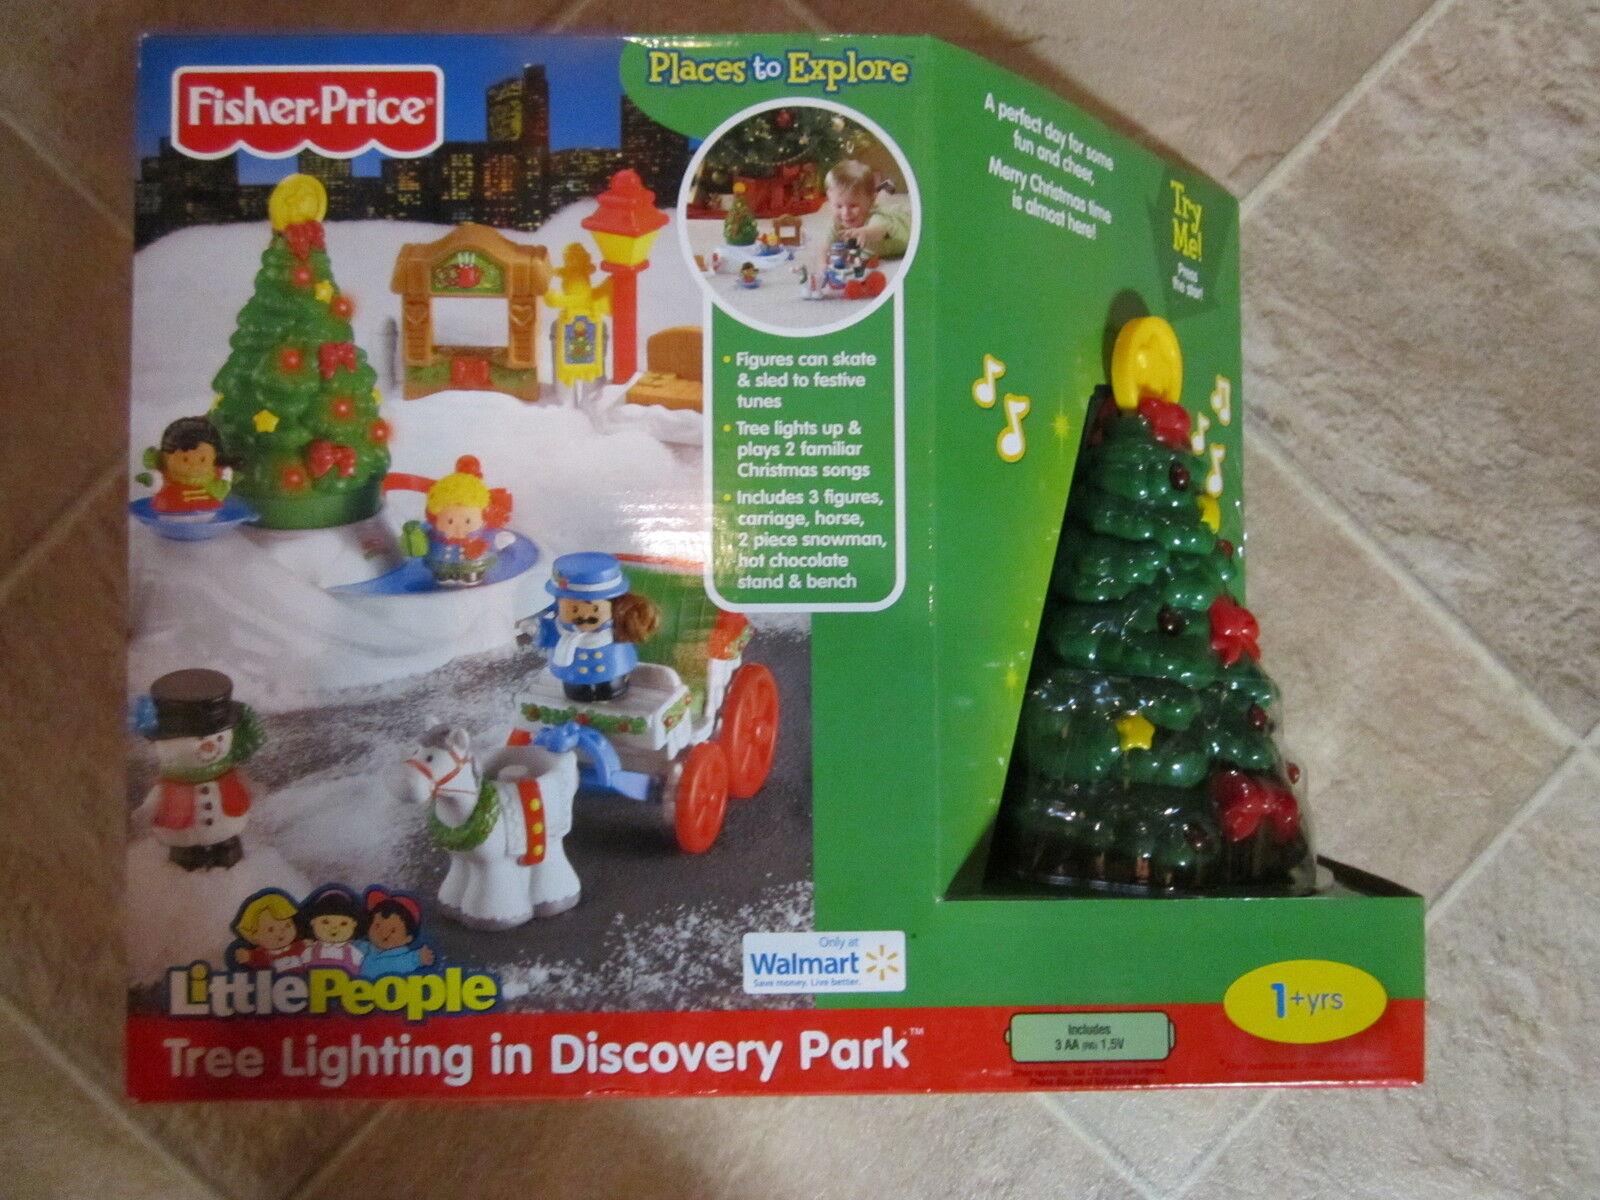 Fisher Price liten människor Christmas Tree ljusing Park New låda salta glassdammän